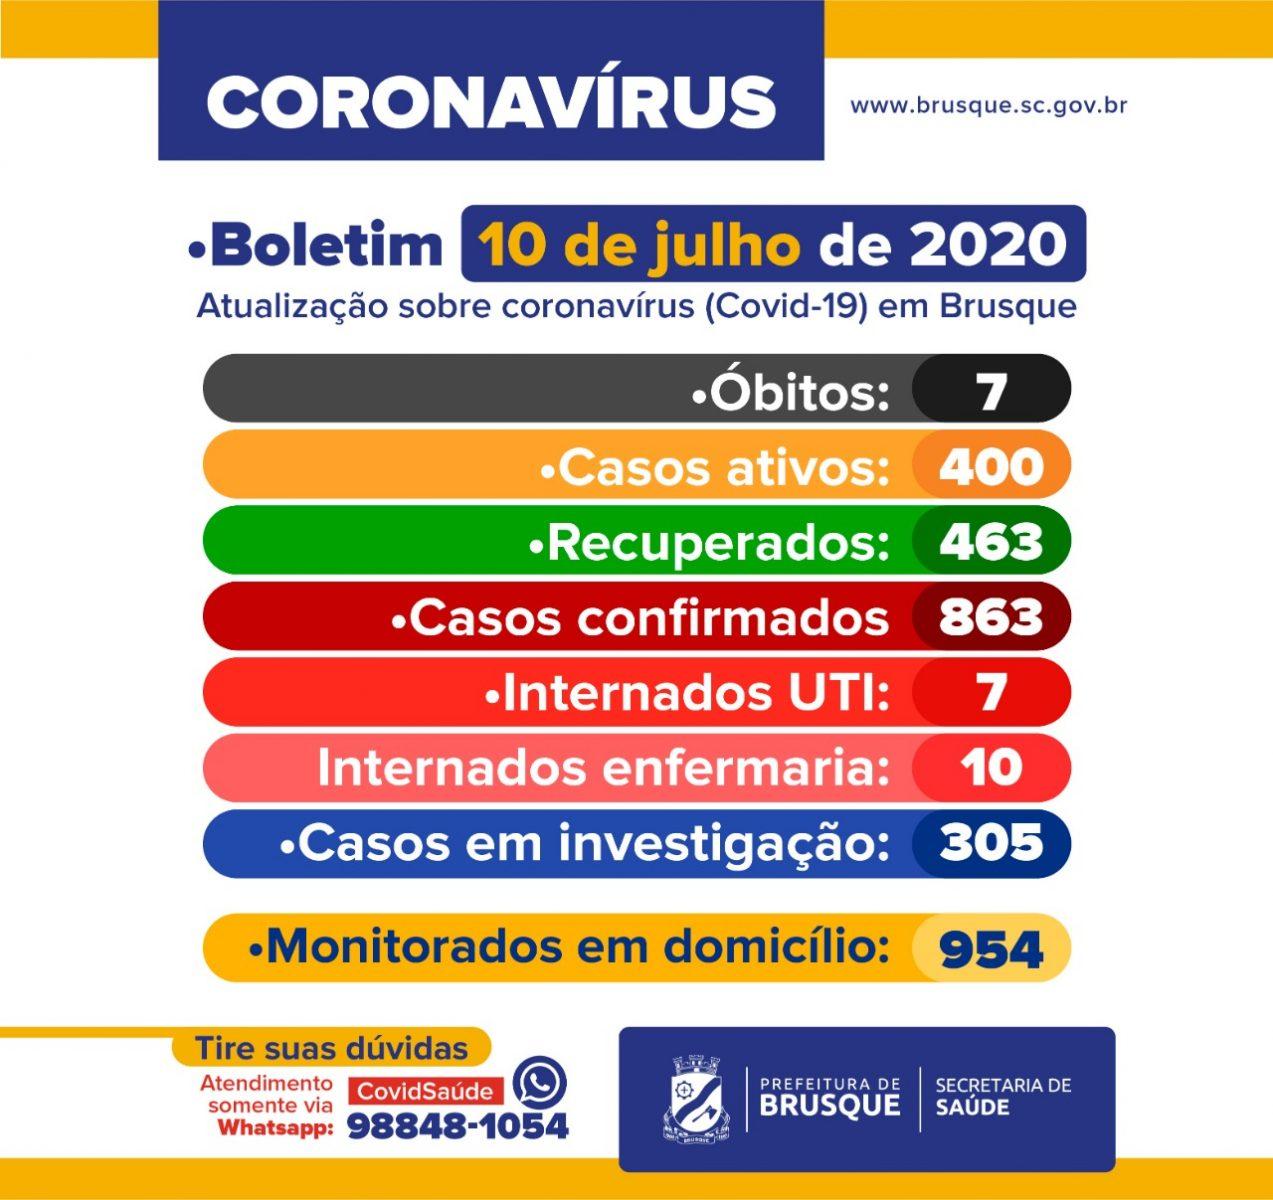 Confira o boletim epidemiológico da Prefeitura de Brusque nesta sexta-feira (10)